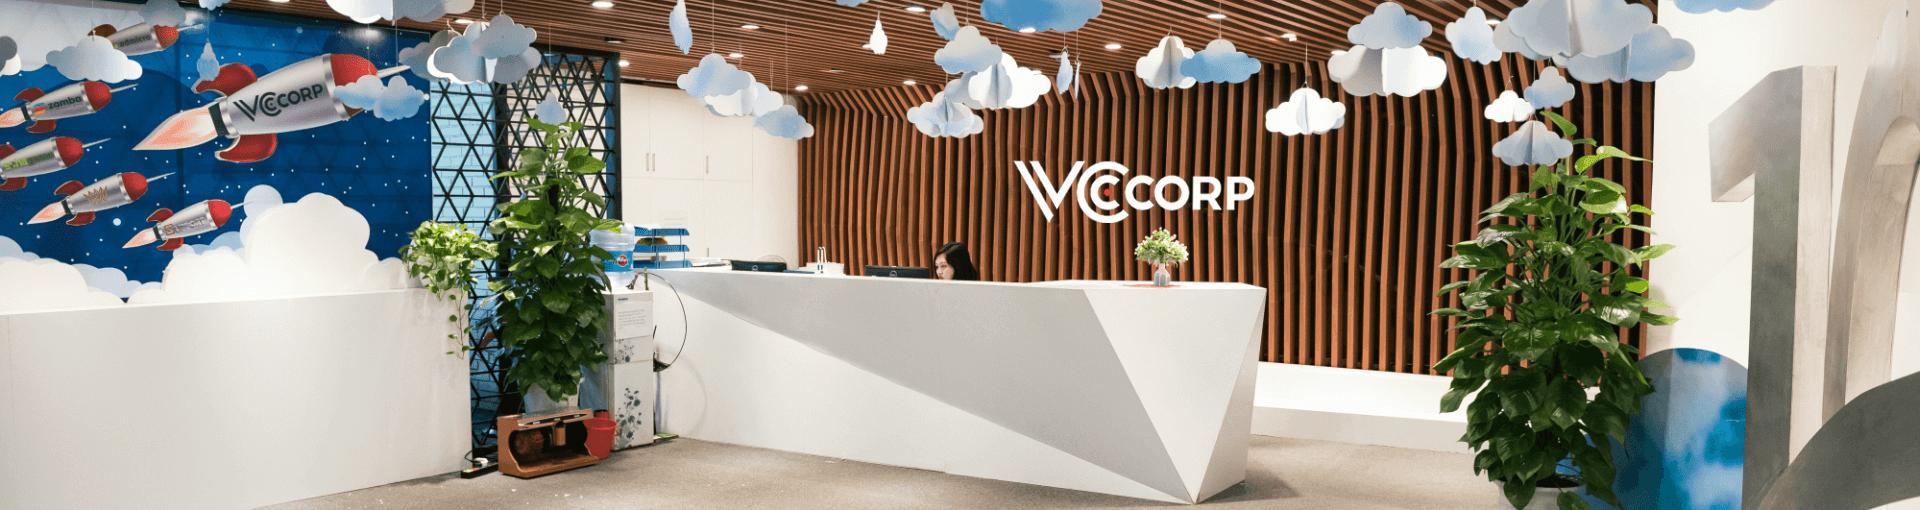 Open jobs at Công ty Cổ phần VCCorp